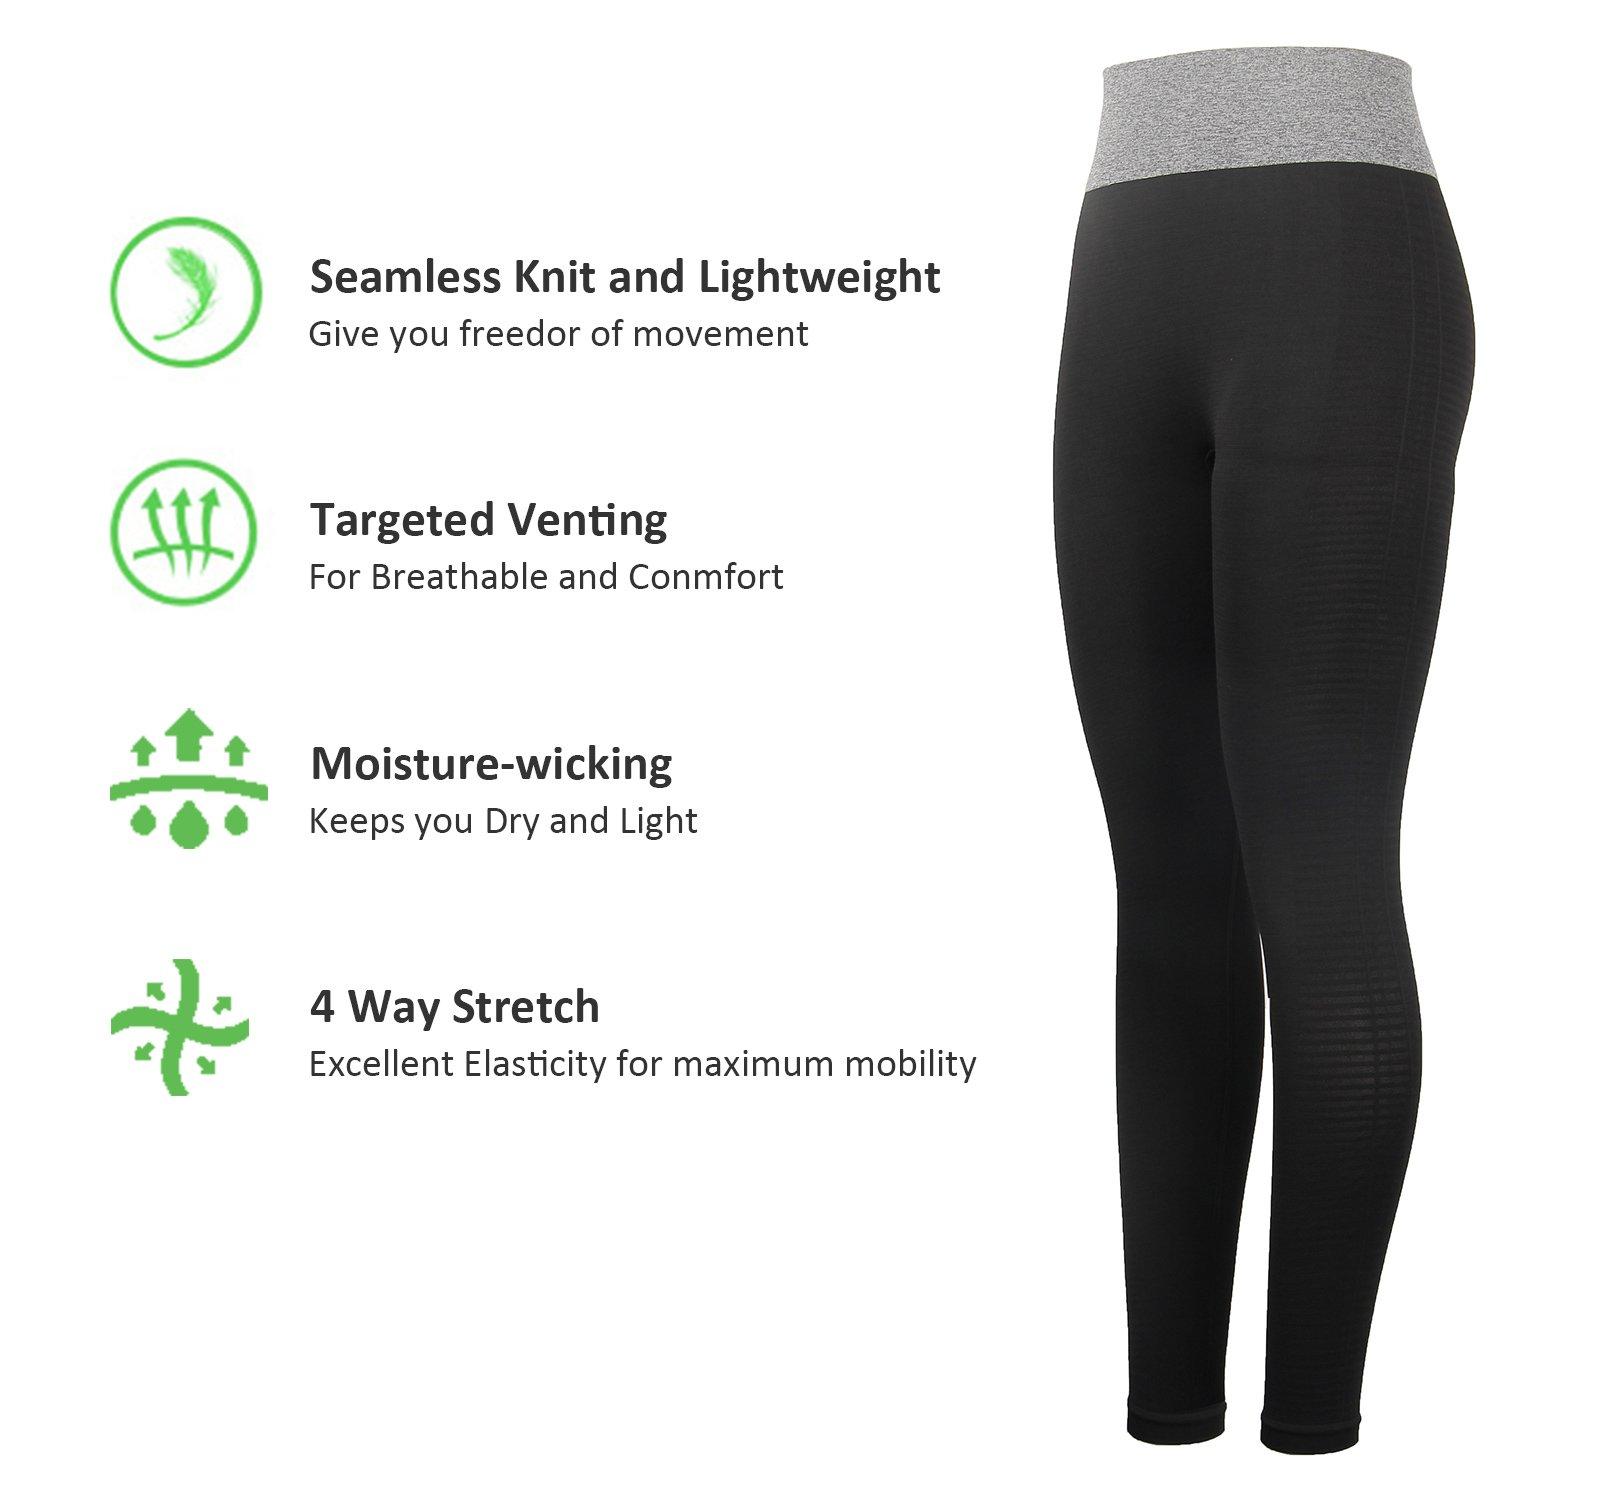 0f3ee95111c796 71uE IFfUYL - iLoveSIA Women's Athleisure Tight Capri Workout Legging